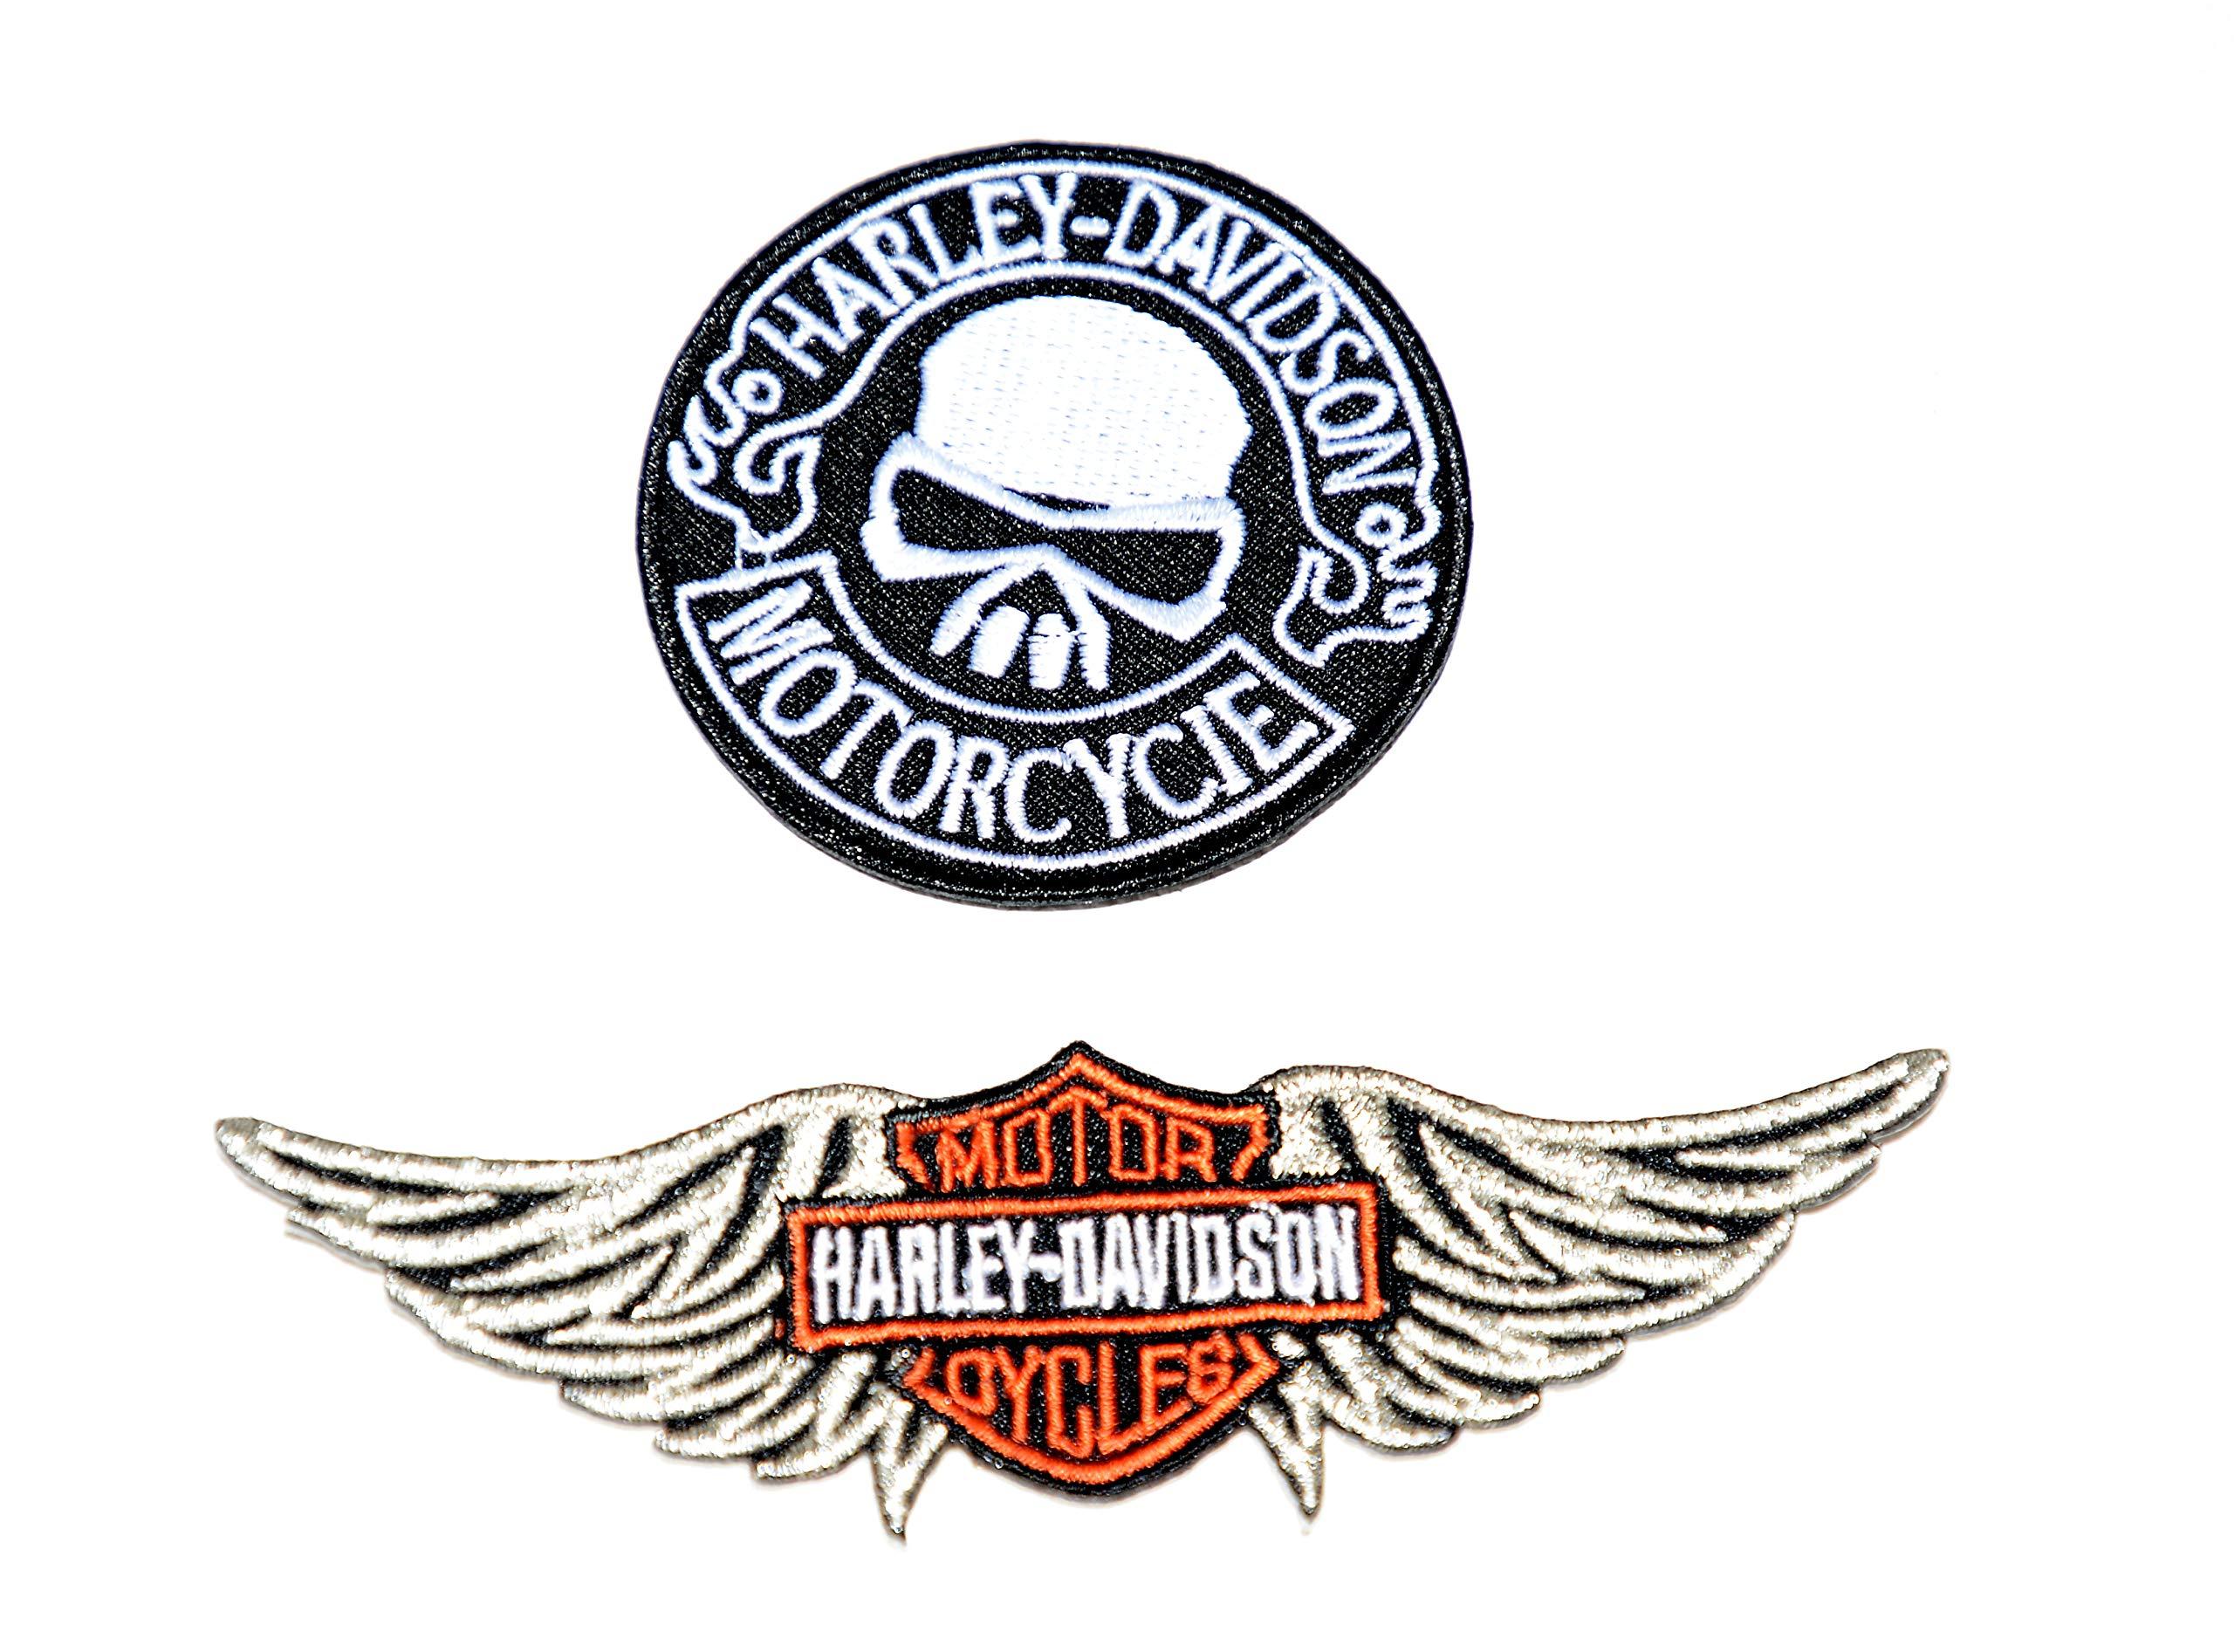 Deluxe Special FXSE CVO Pro Street Breakout FLSTF FXSBSE Softail FLSTSE FLSTFB Convertible Sacoche Cavali/ère Solo 11l pour Harley Davidson Cross Bones FLSTNSE Fat Boy